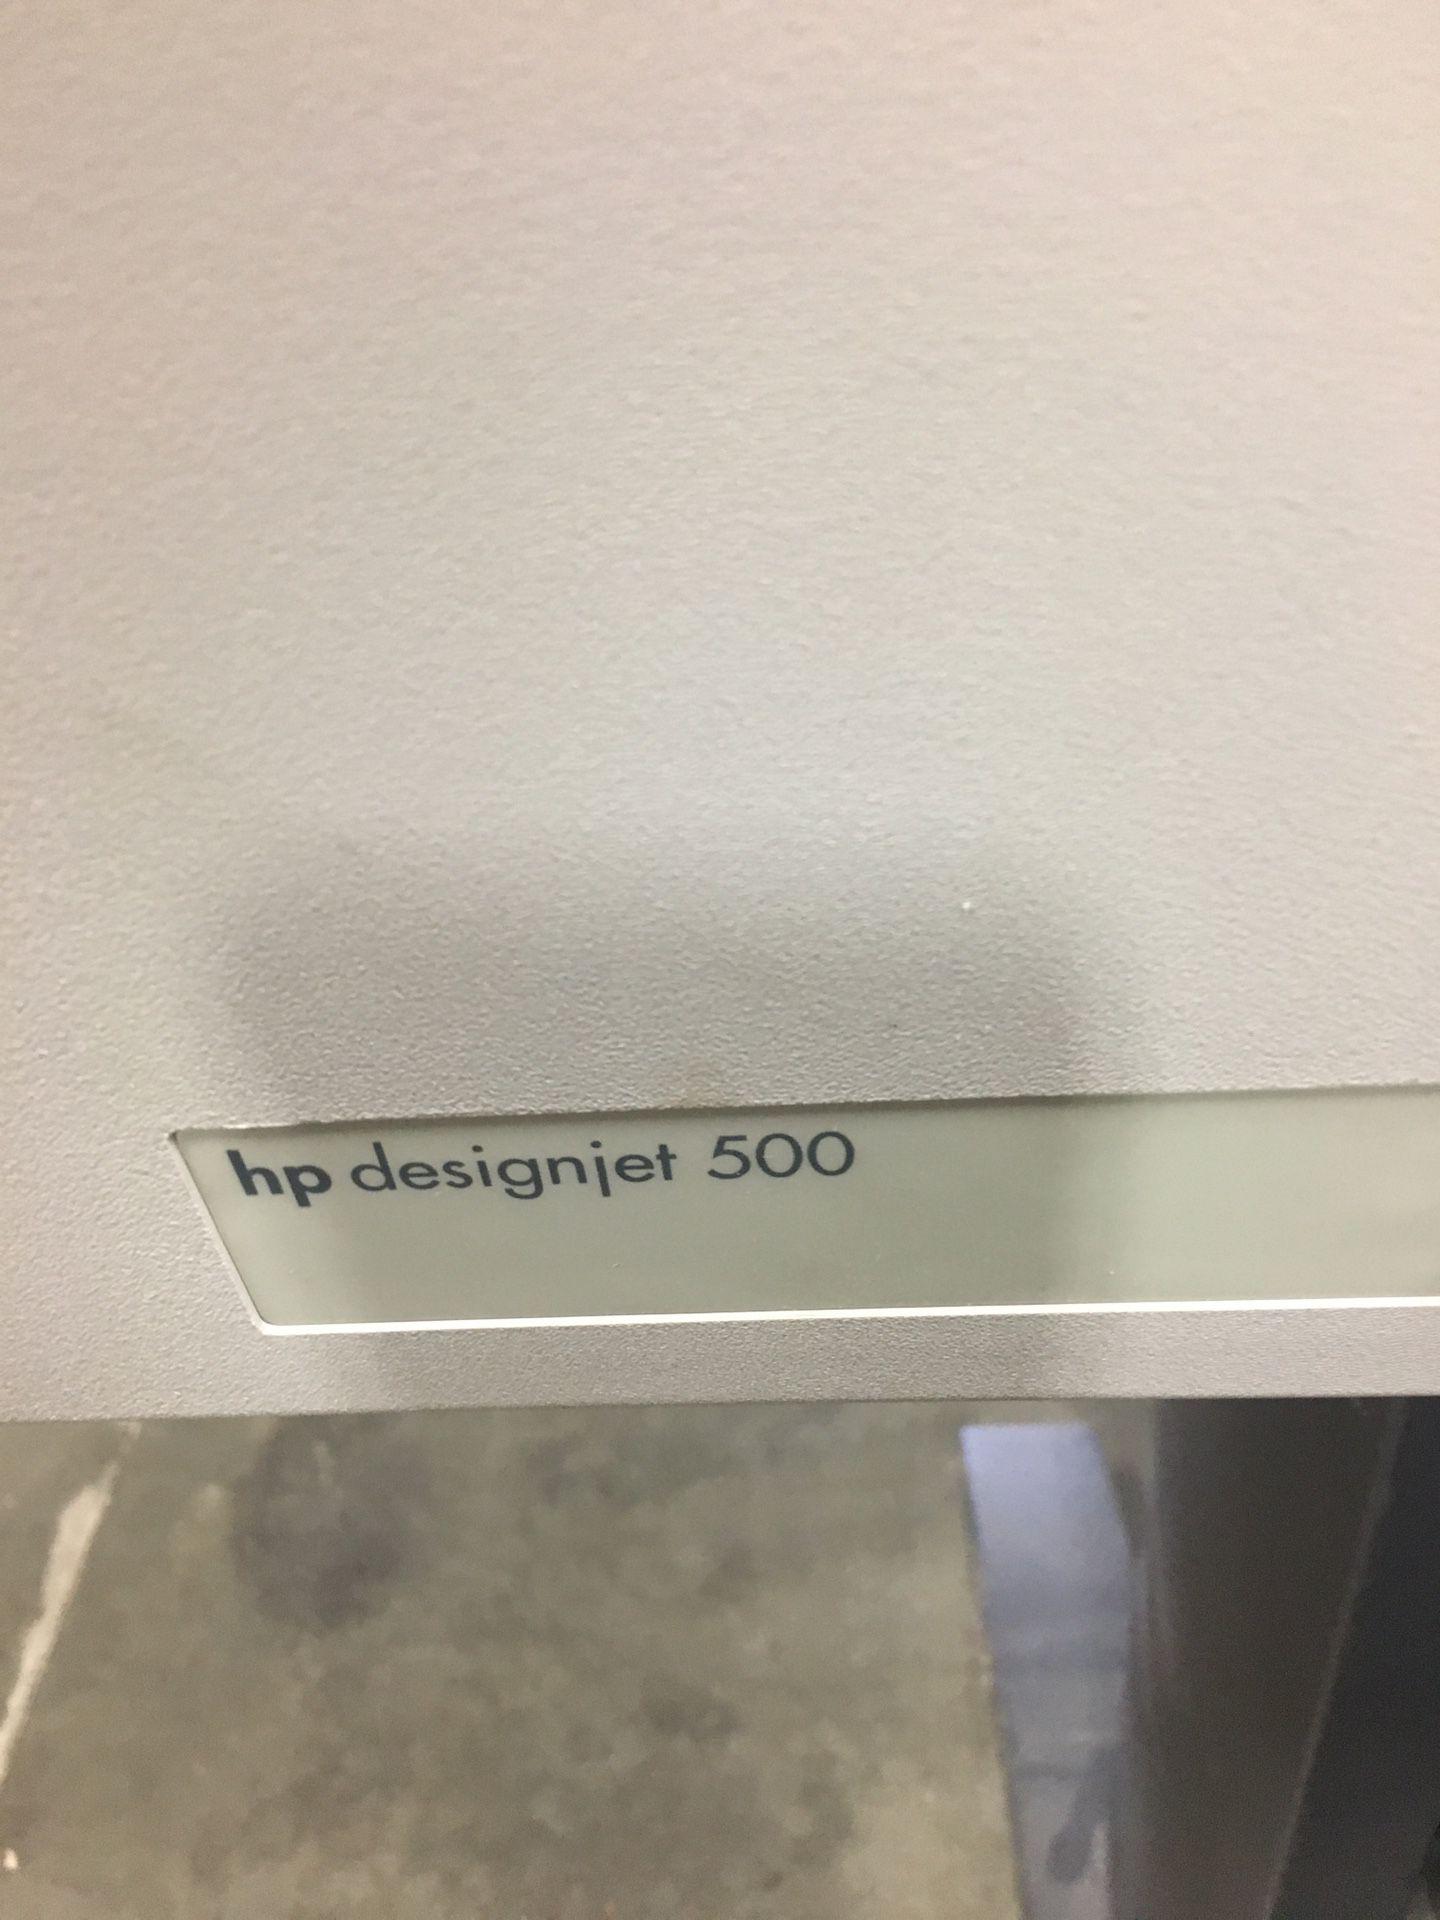 Blueprint printer HP